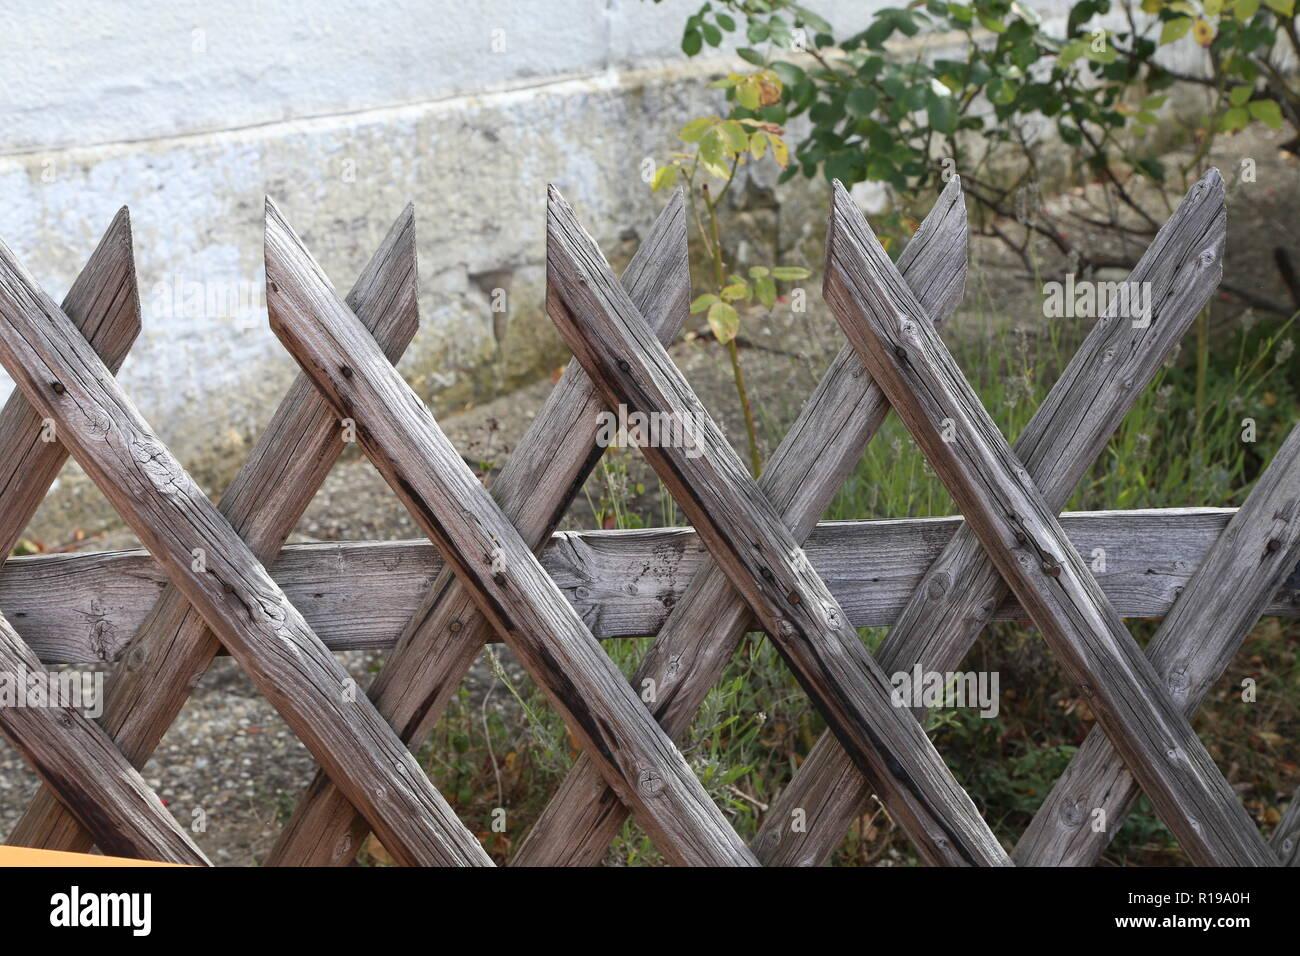 Wattle Zaun Im Garten Garten Holzzaun Stockfoto Bild 224554865